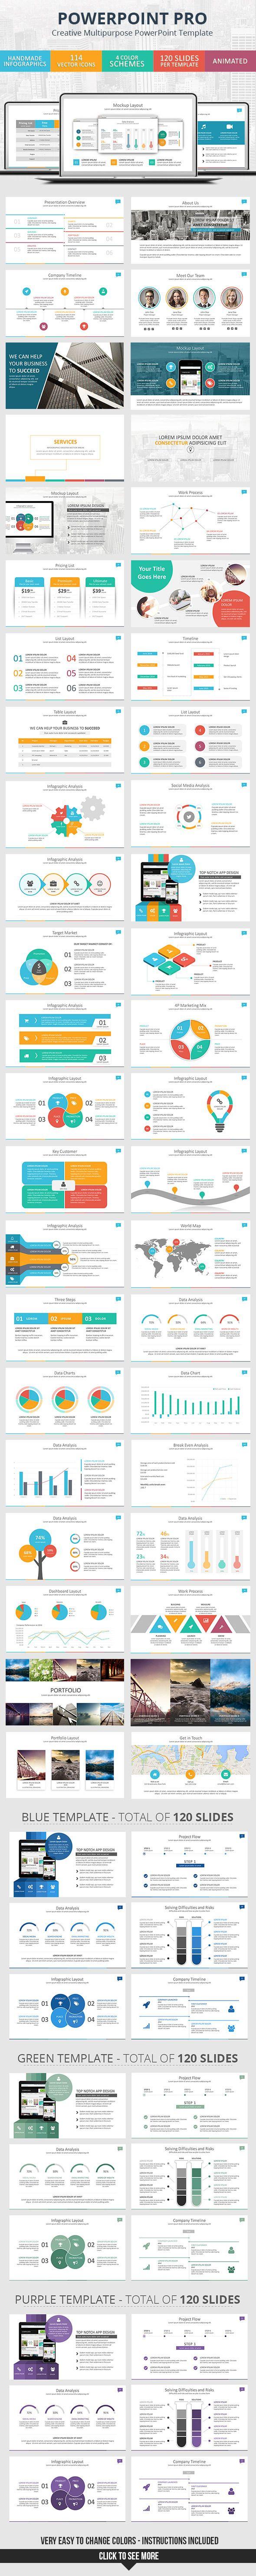 PowerPoint Pro – Presentation Template #design Download: http://graphicriver.net/item/powerpoint-pro-presentation-template/12105282?ref=ksioks